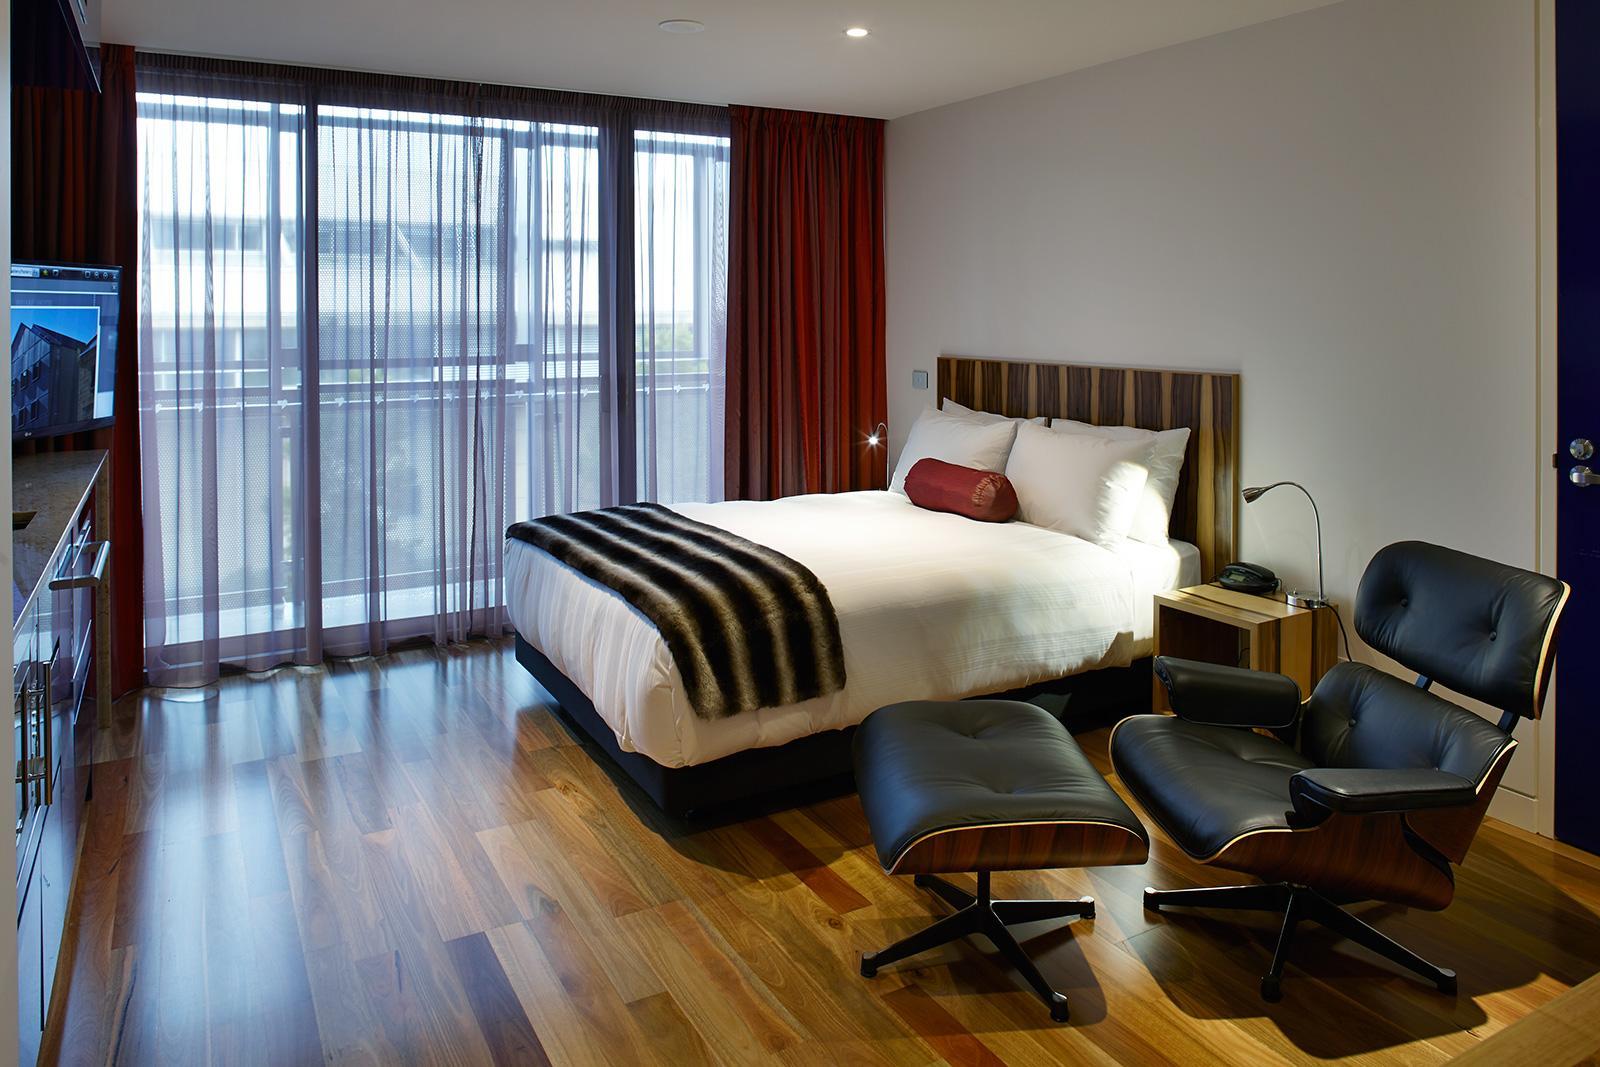 Studio Apartment accommodation in Hobart